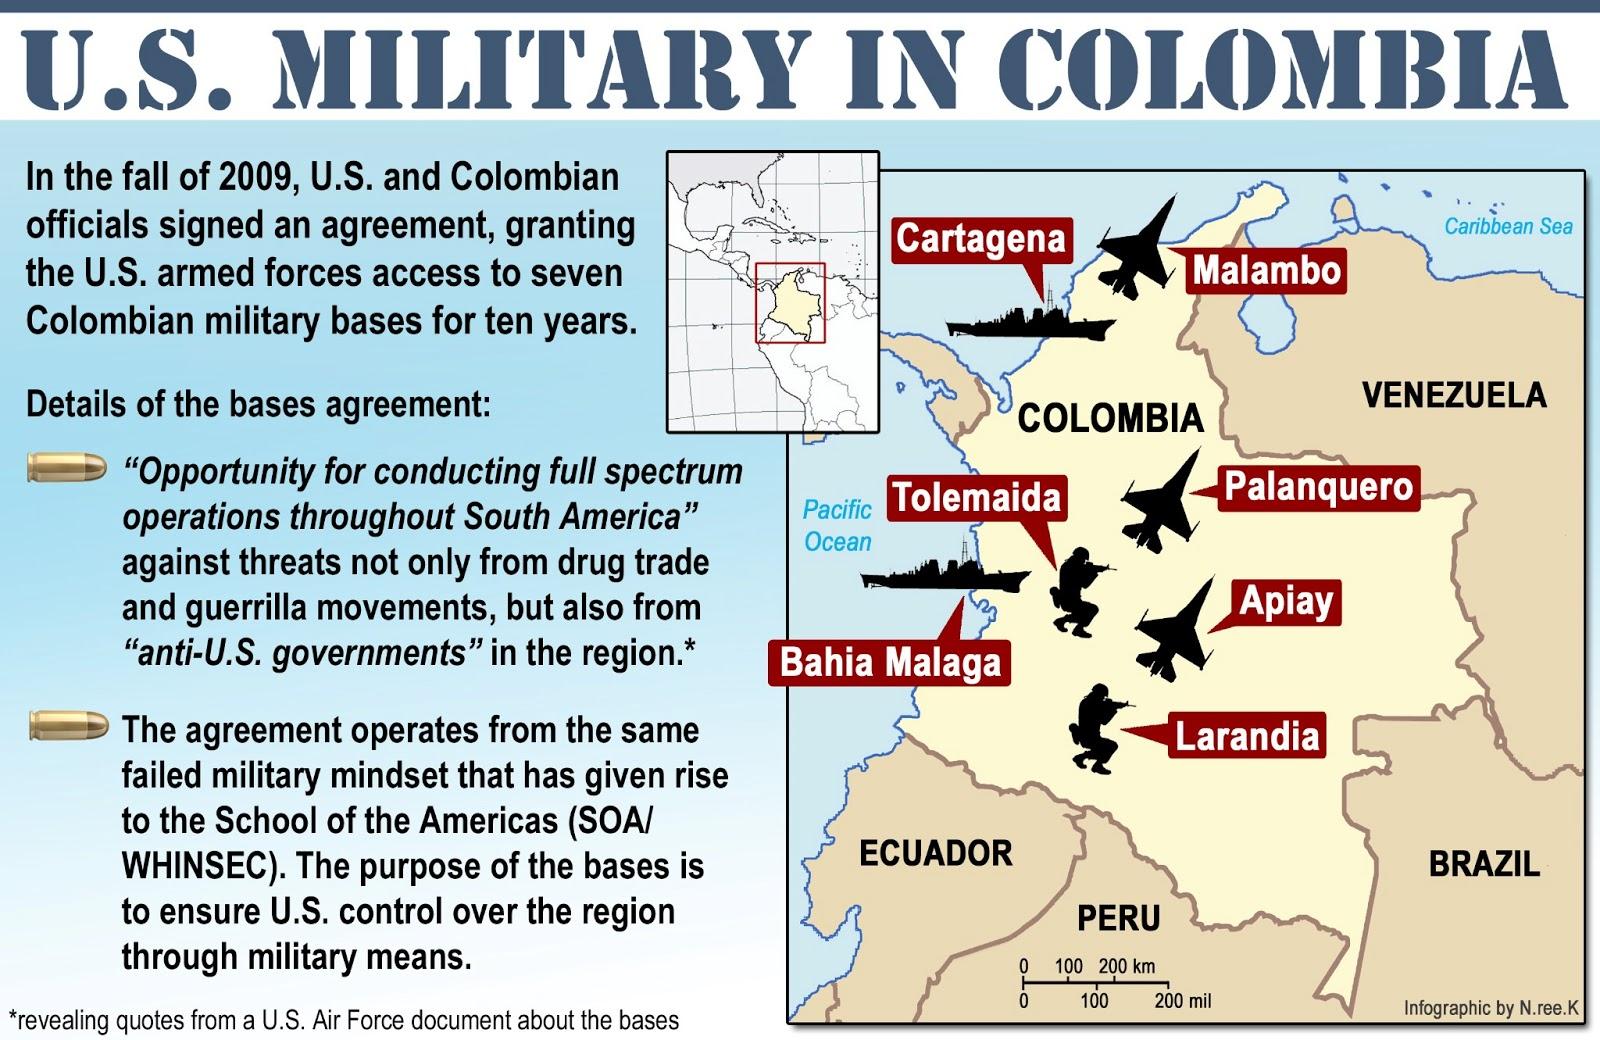 https://i0.wp.com/1.bp.blogspot.com/-Mkg-n943qx8/UbE3oaCsI8I/AAAAAAAABK4/rYn8FijR1vg/s1600/us-bases-in-colombia%5B1%5D.jpg?resize=696%2C452